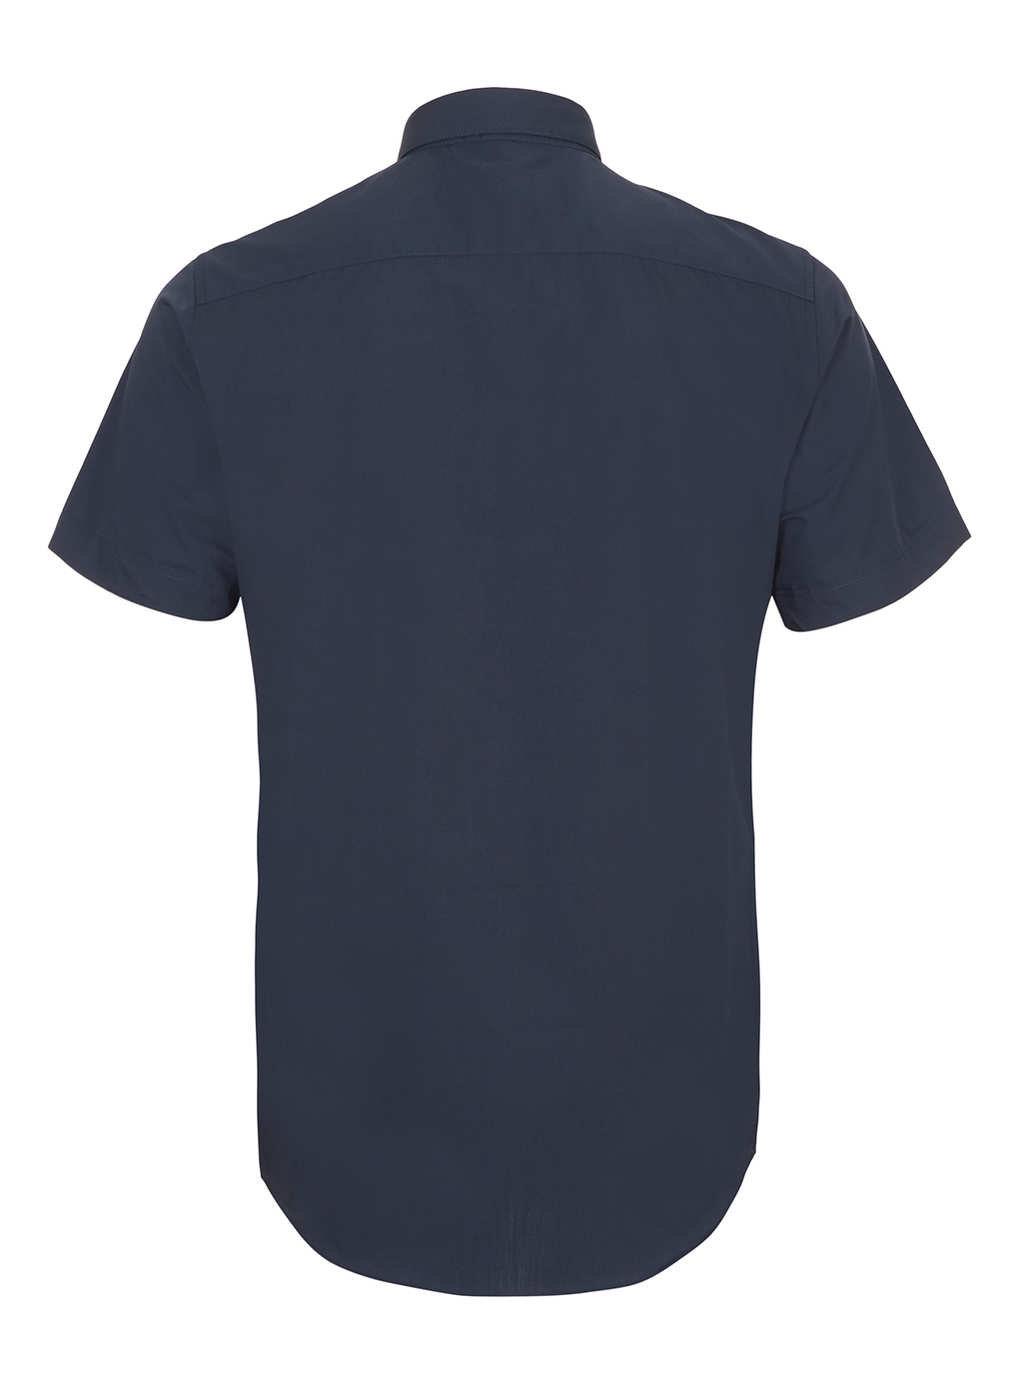 Topman Navy Short Sleeve Slim Button Down Smart Shirt In